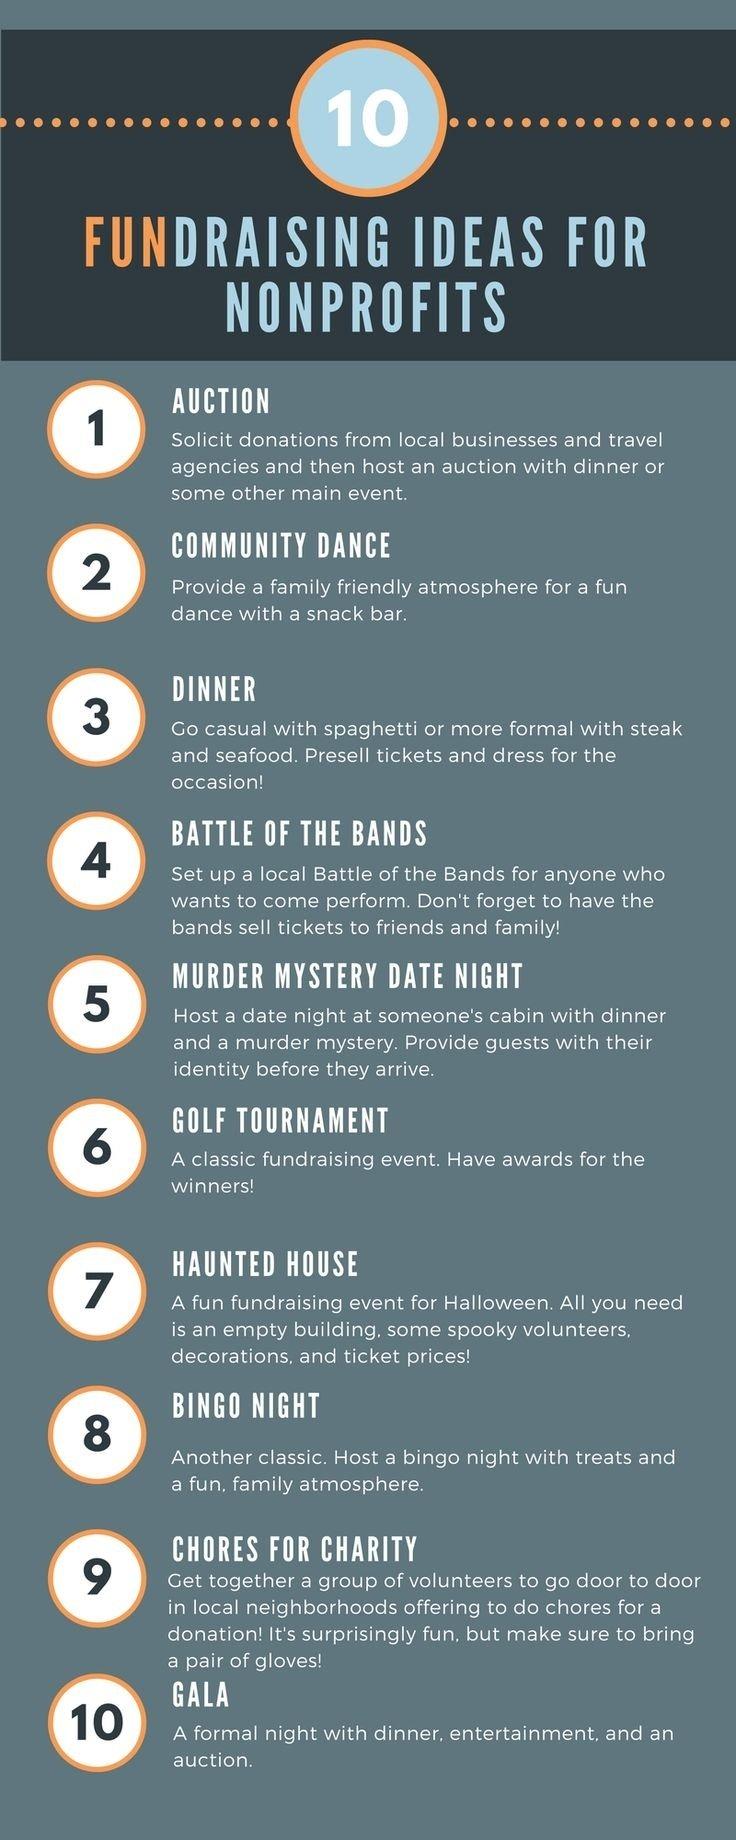 10 Trendy Fun Fundraising Ideas For High School 17 unique fundraising ideas infographic philanthropy pinterest 2 2020